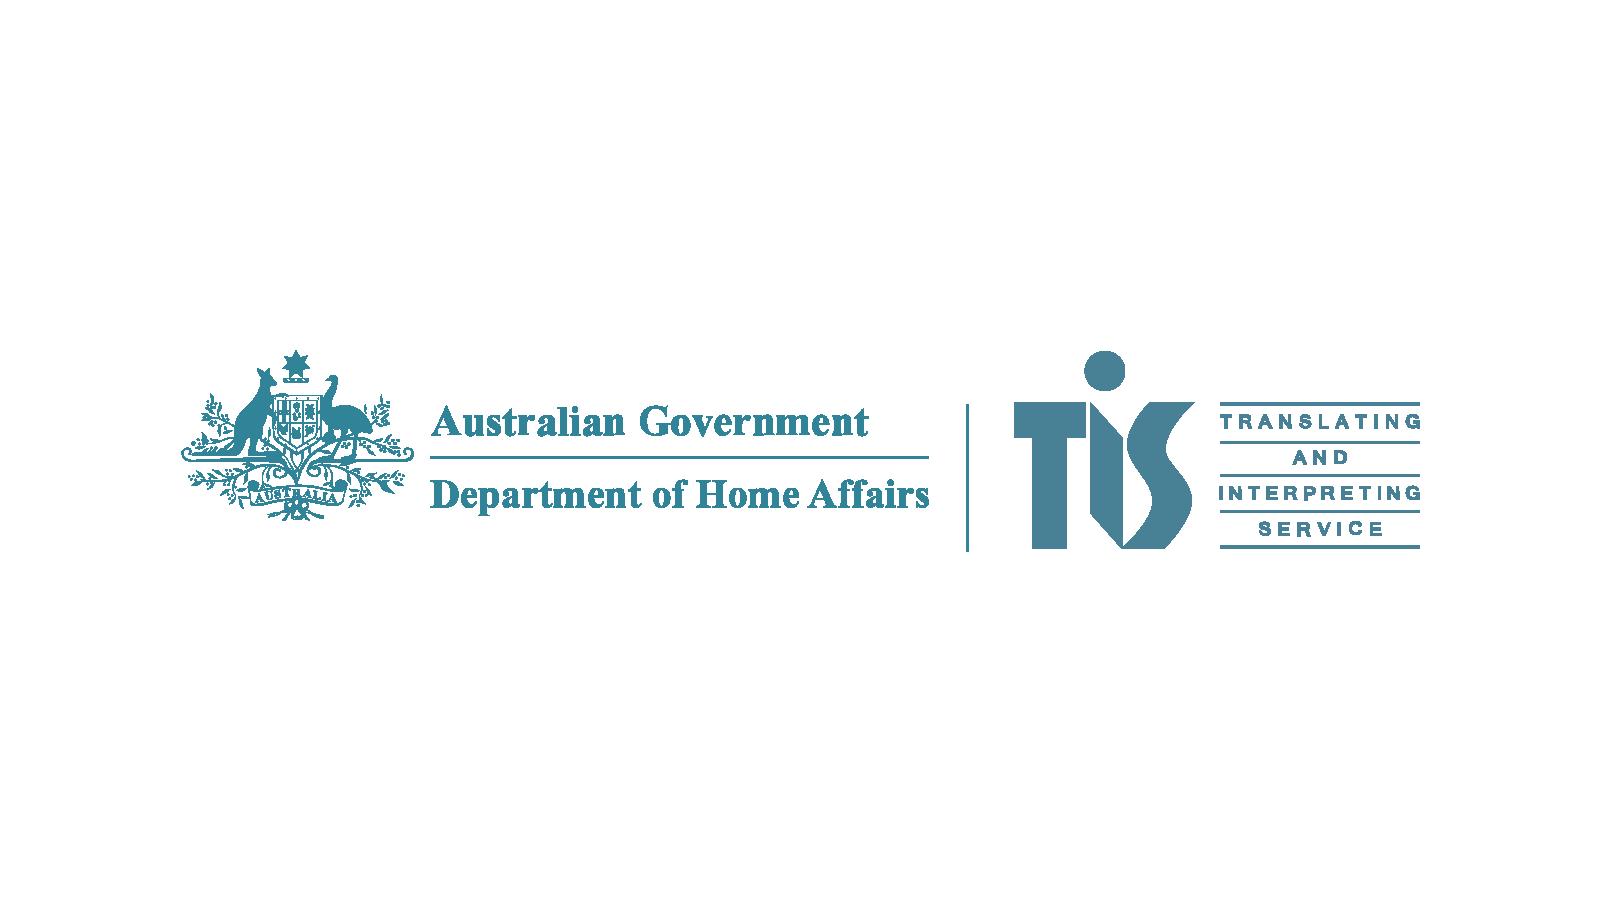 The Translating and Interpreting Service (TIS National) Logo